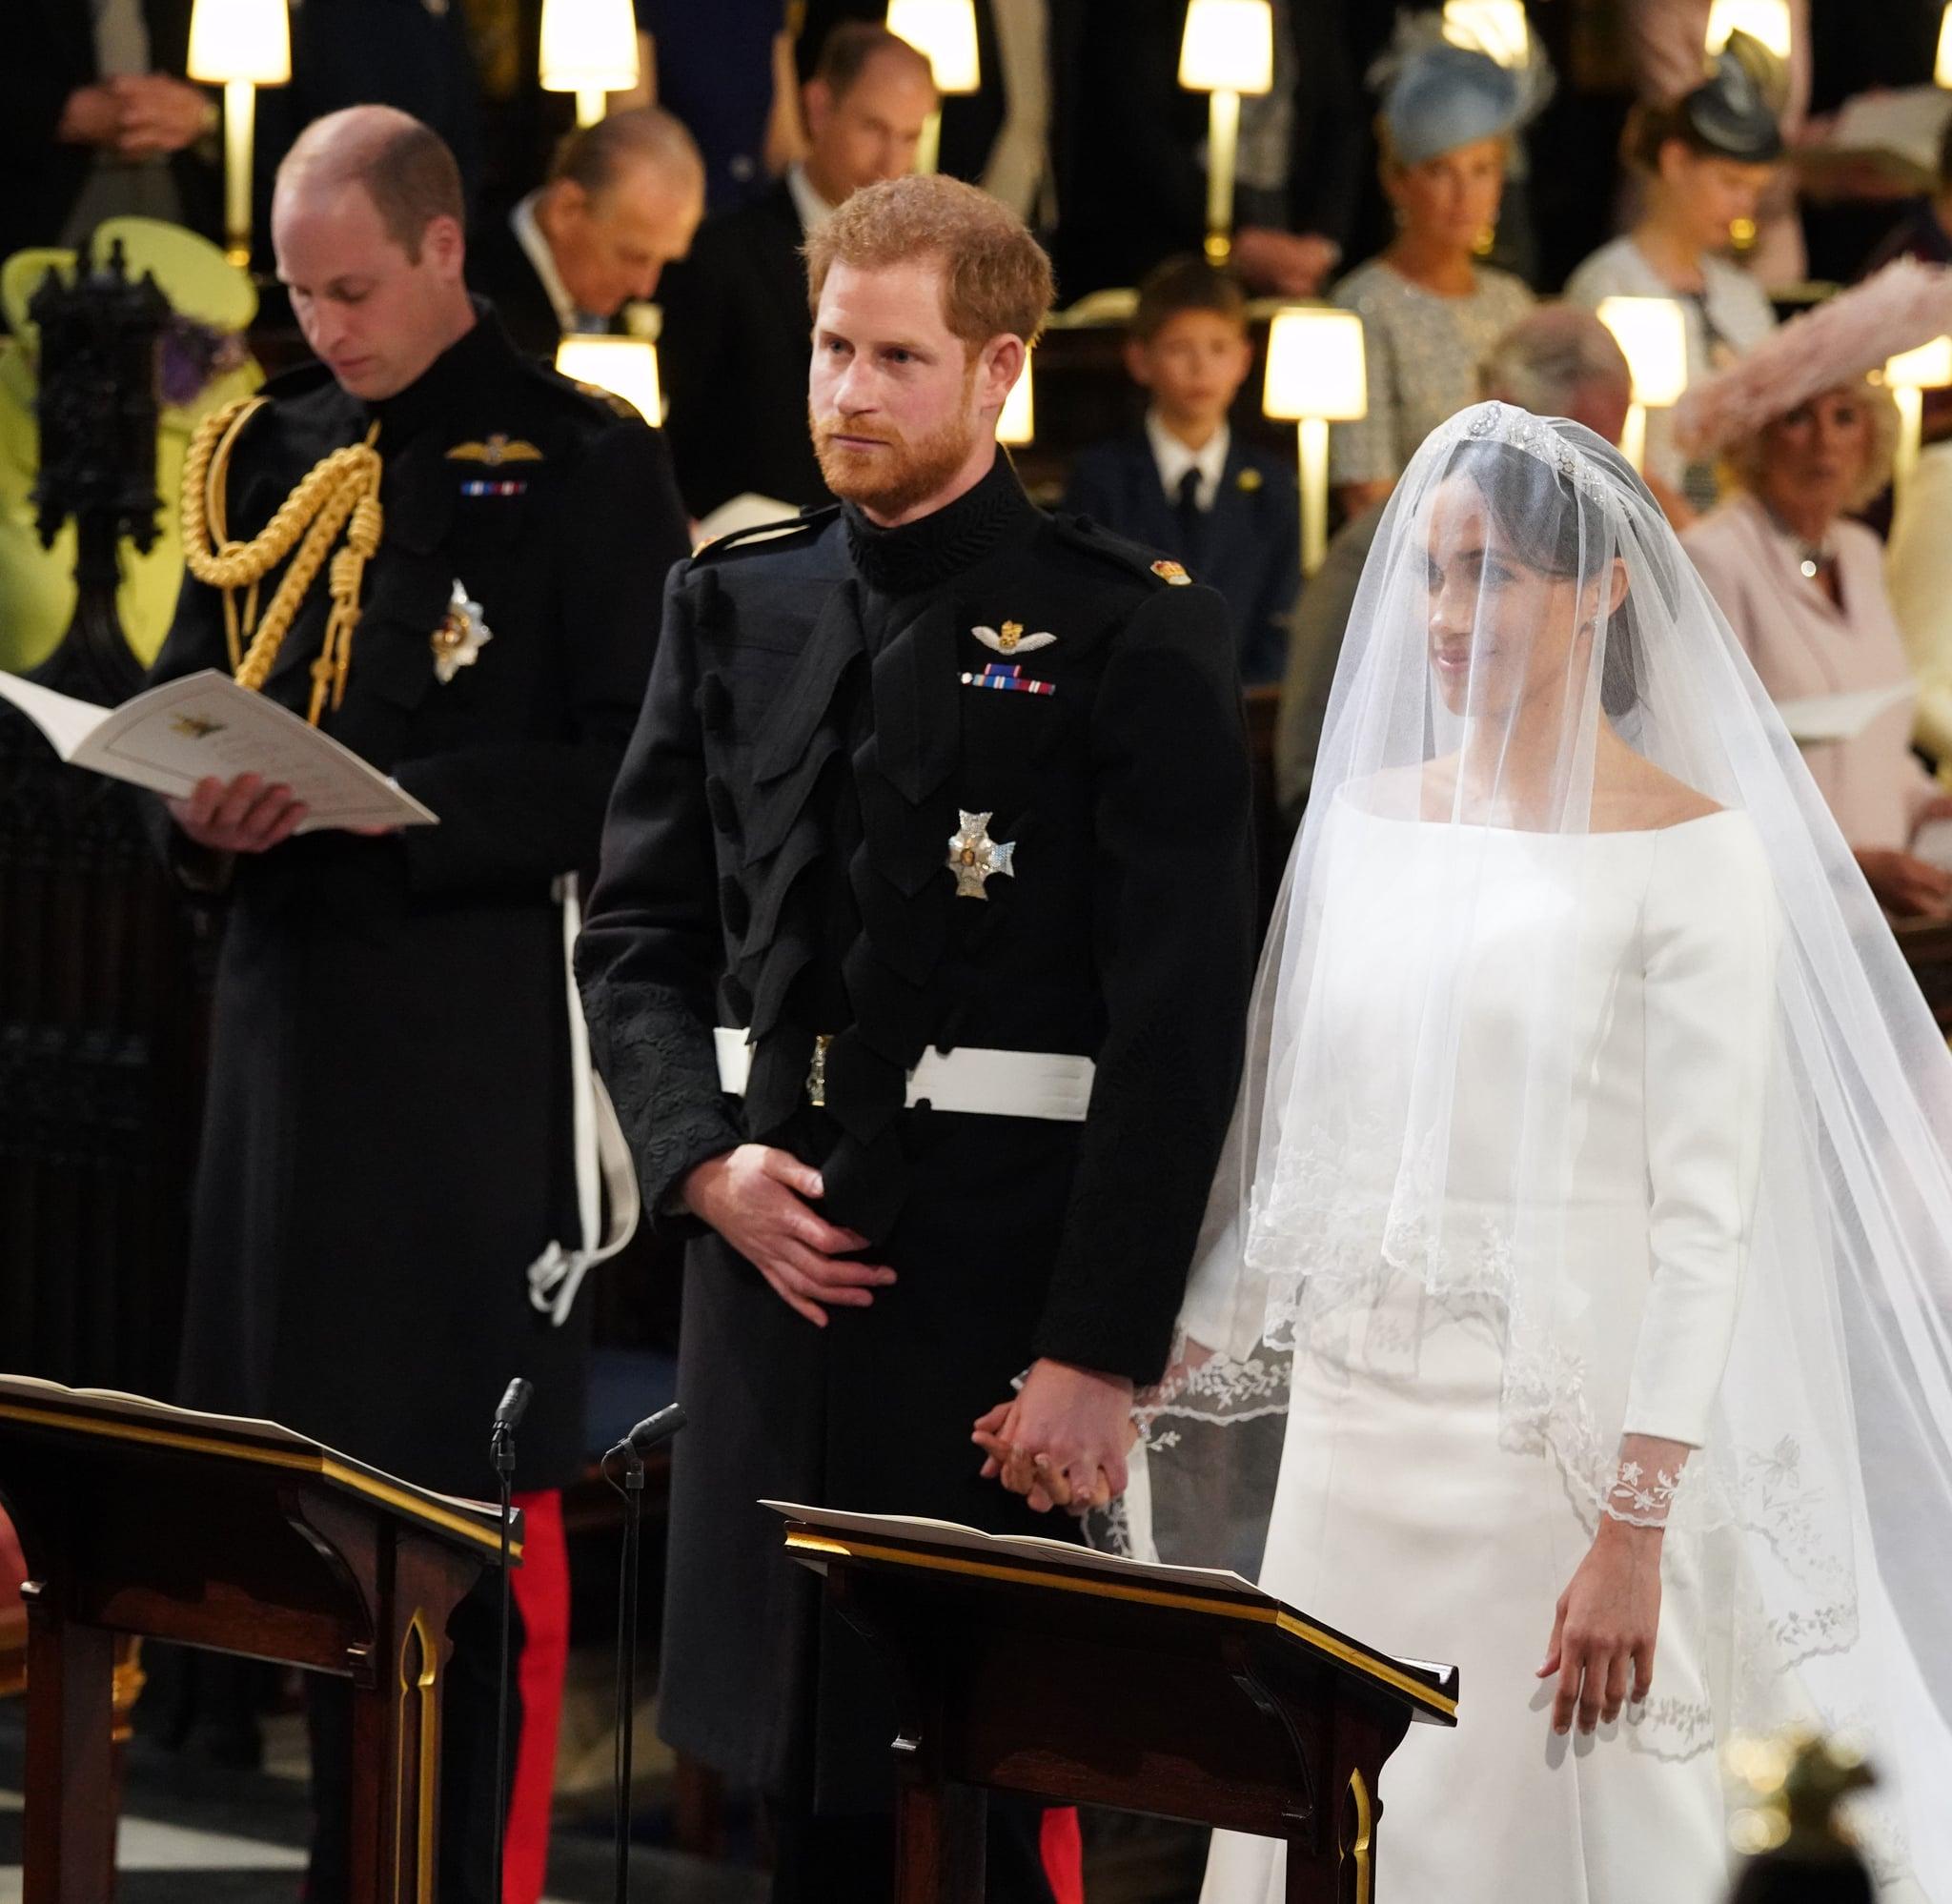 prince harry and meghan markle wedding pictures popsugar celebrity prince harry and meghan markle wedding